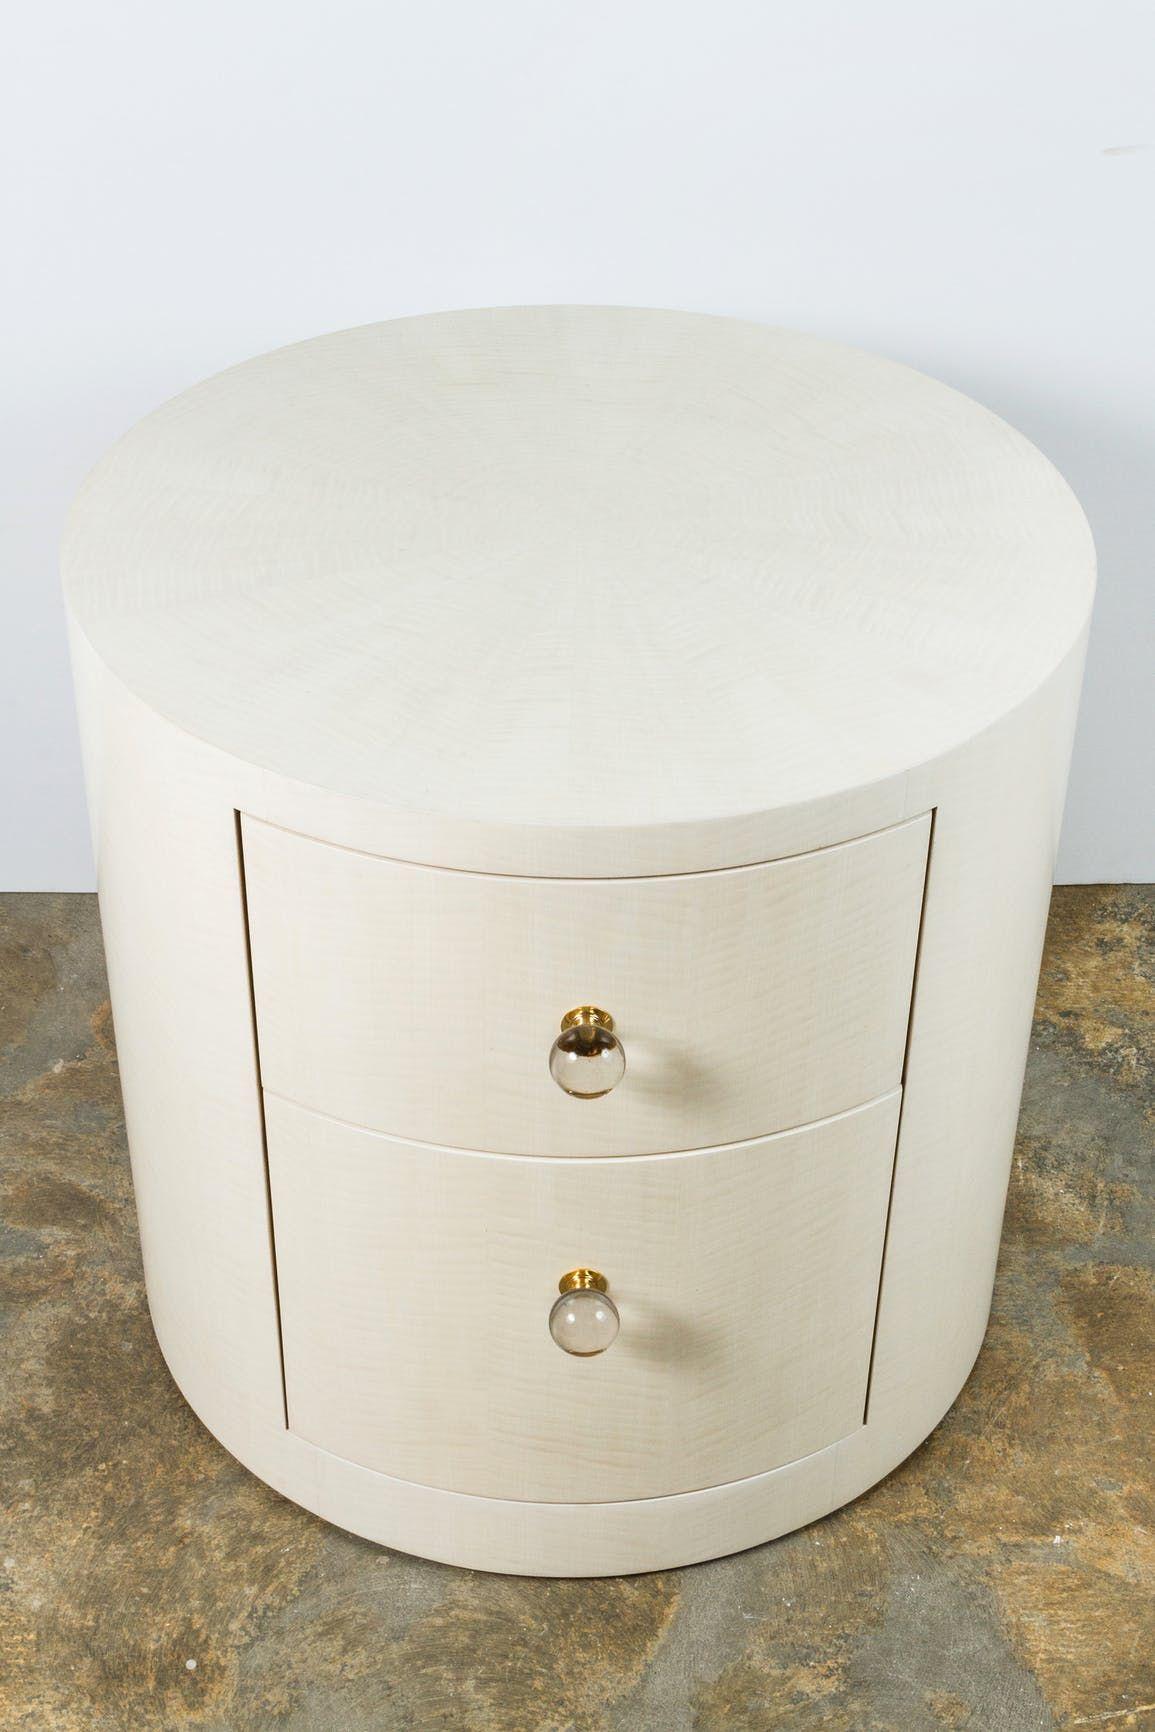 Nightstand Table: Italian-Inspired 1970s Style Round Nightstand